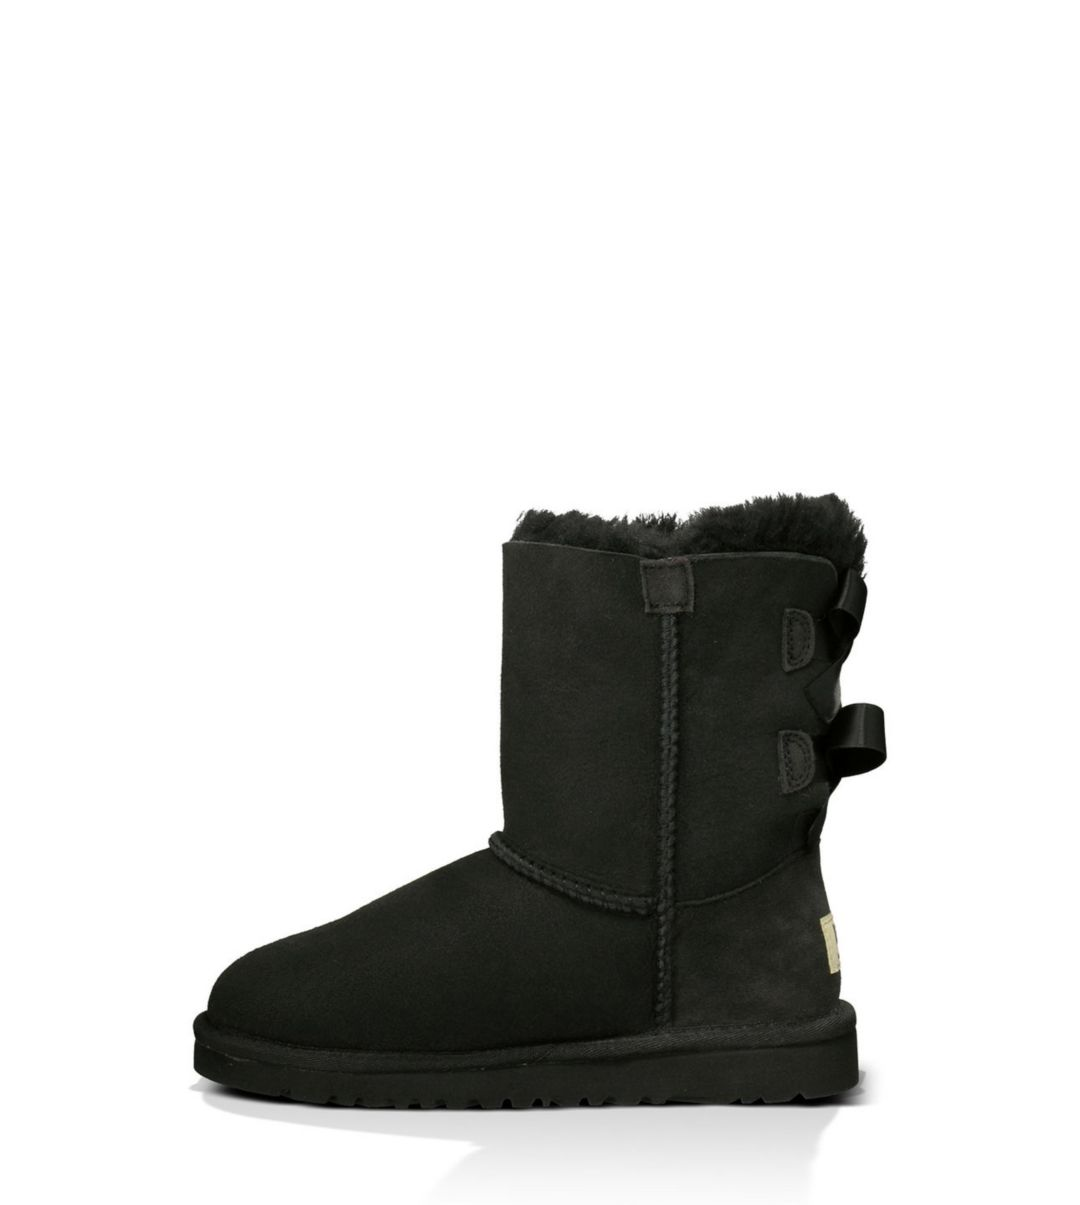 65bb1463081 UGG Australia Kids' Bailey Bow Winter Boots